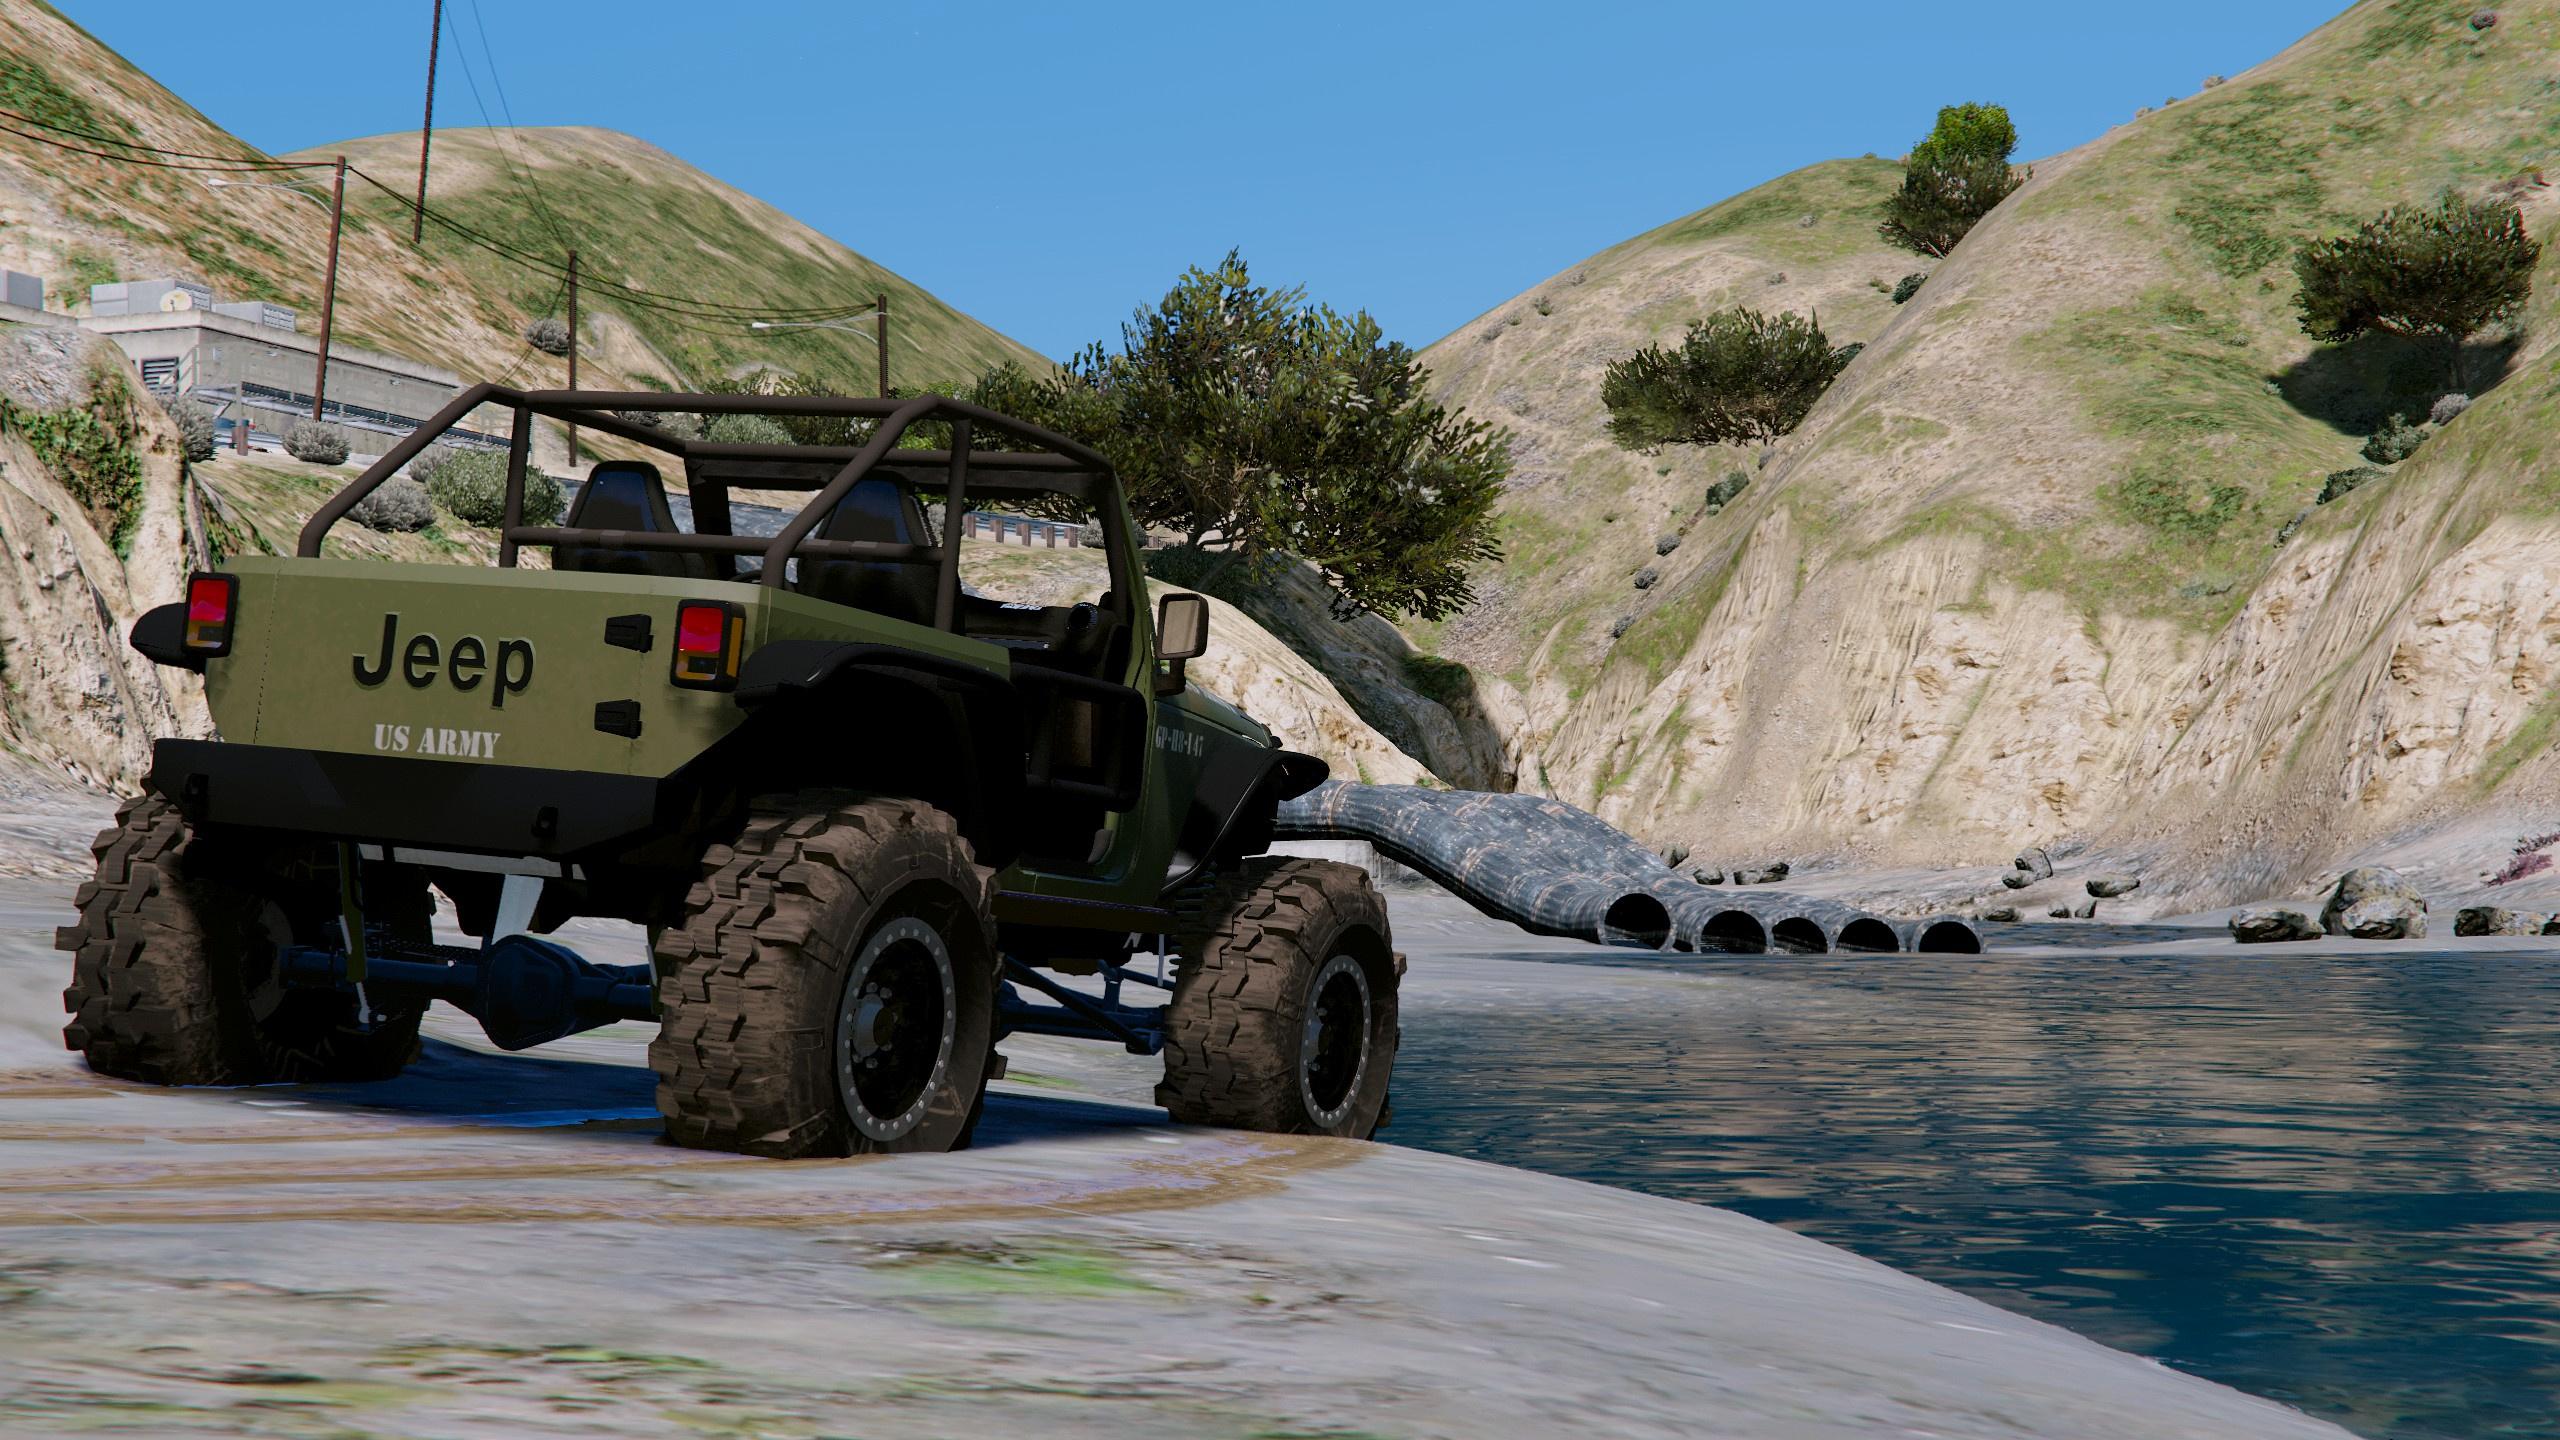 Gta 5 army jeep